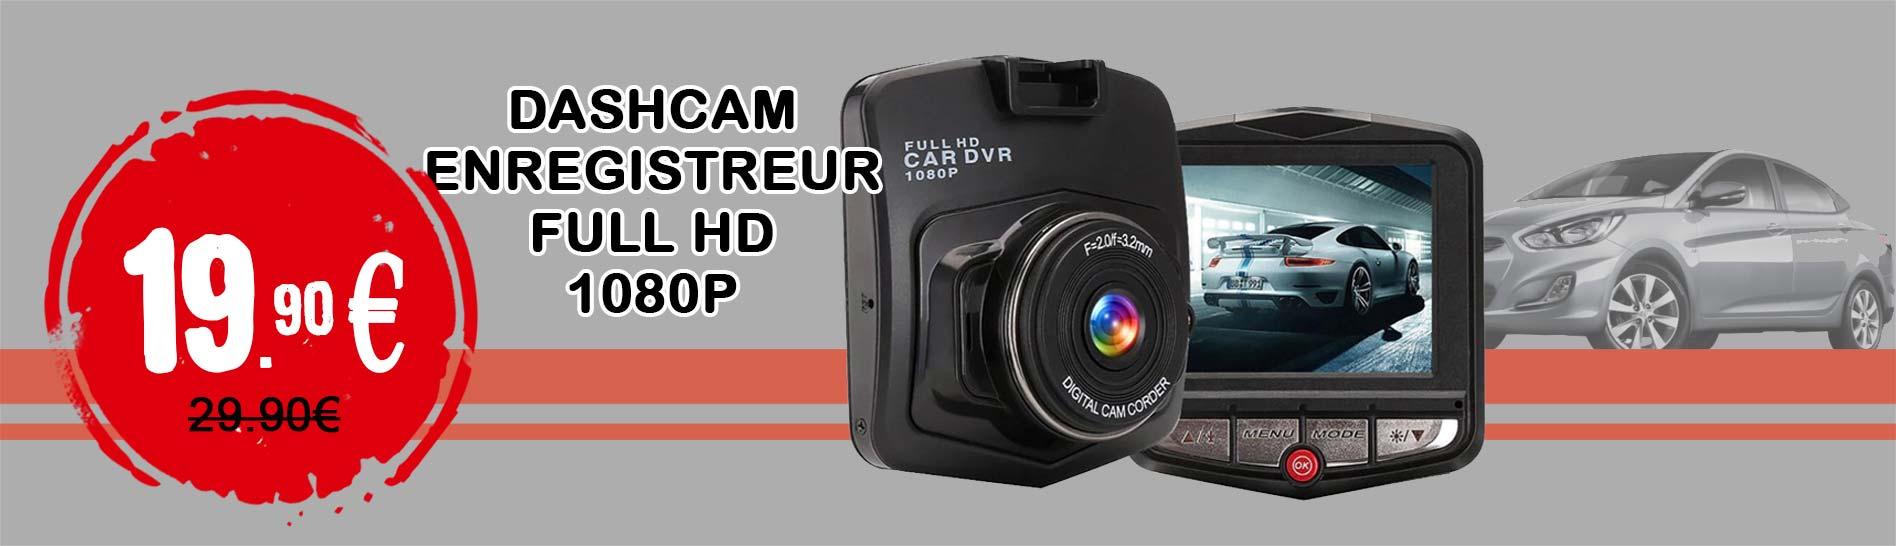 slider-dashcam-1080p-call-of-security